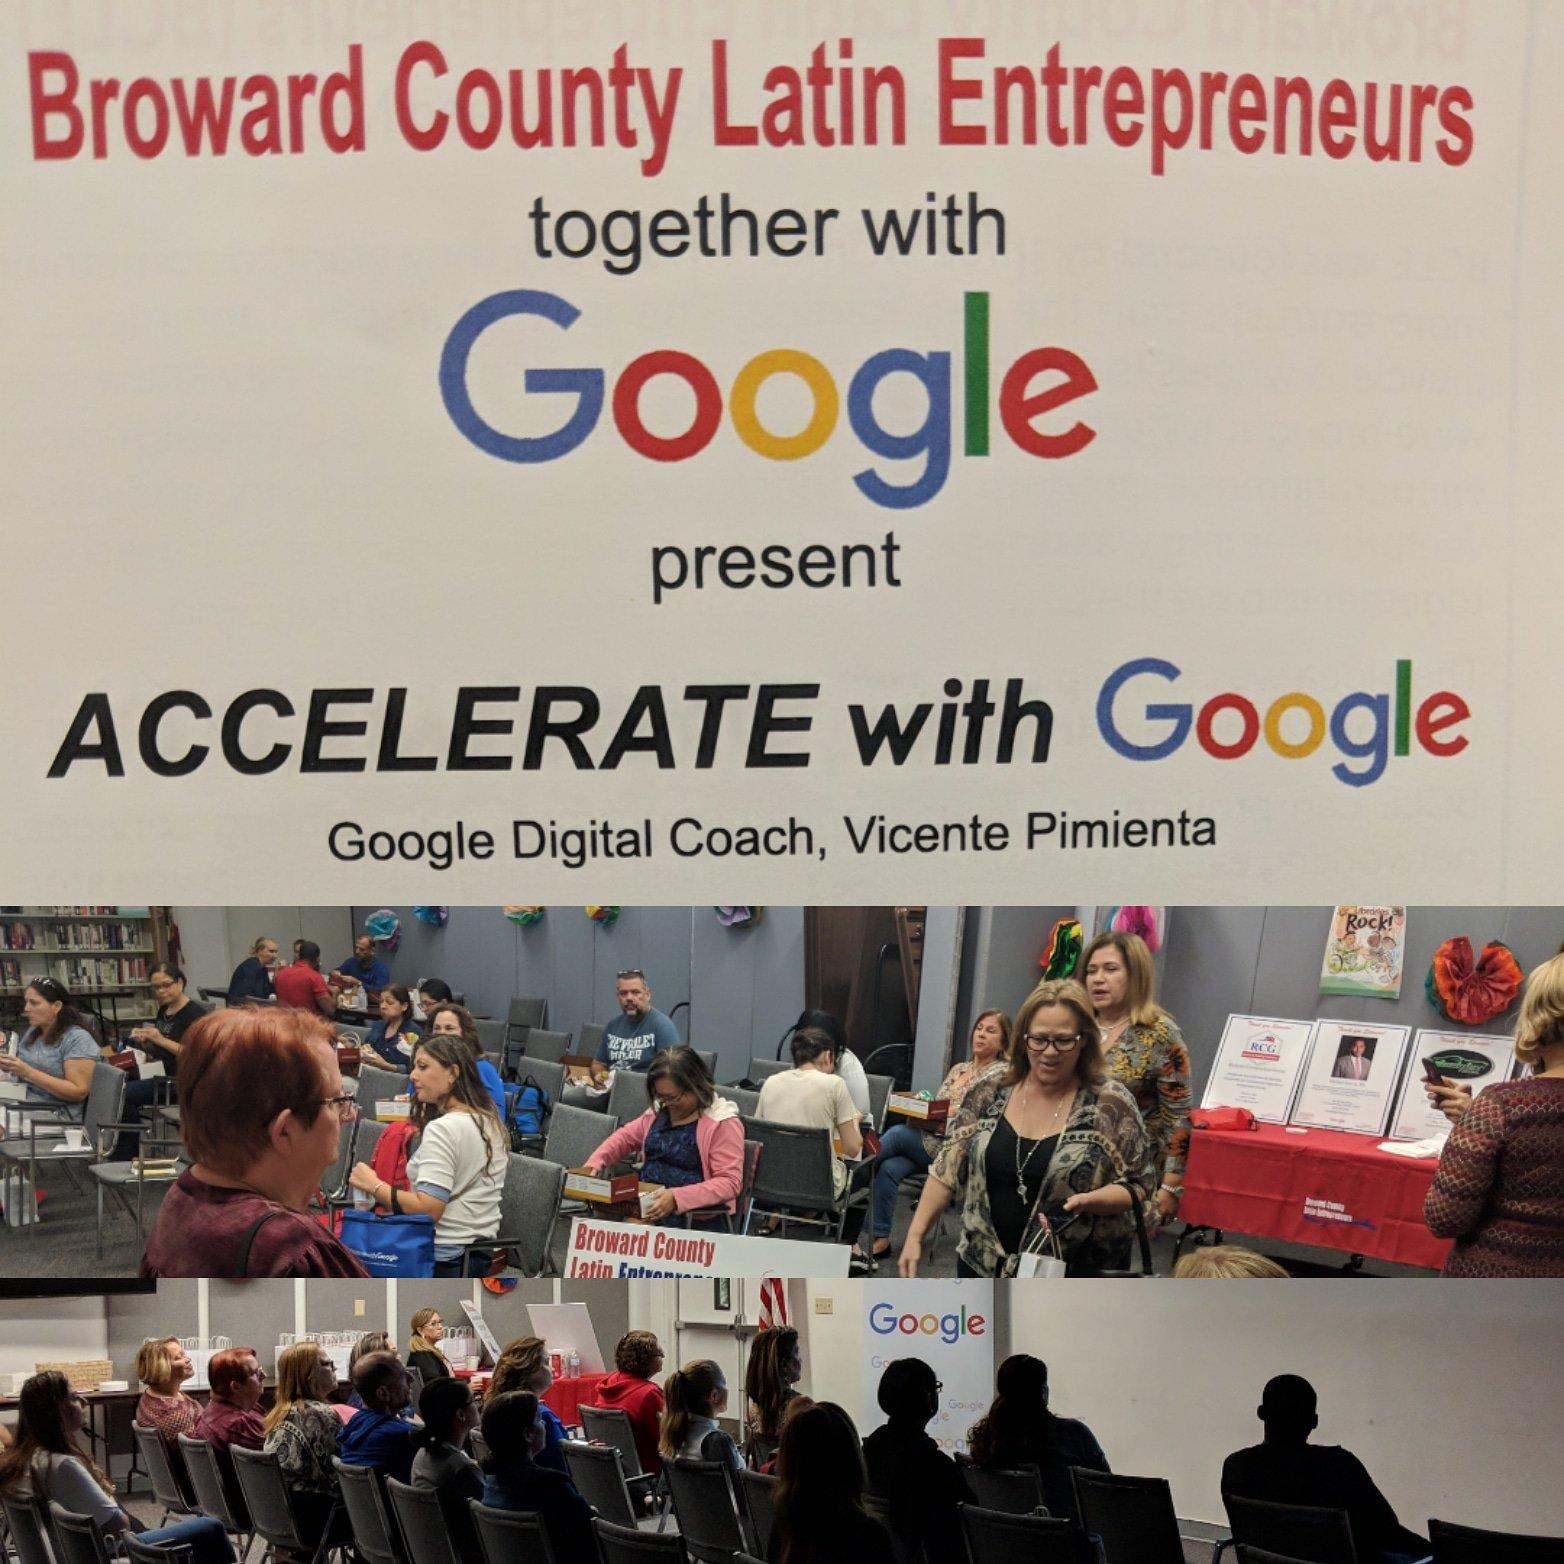 Broward County Latin Entrepreneurs